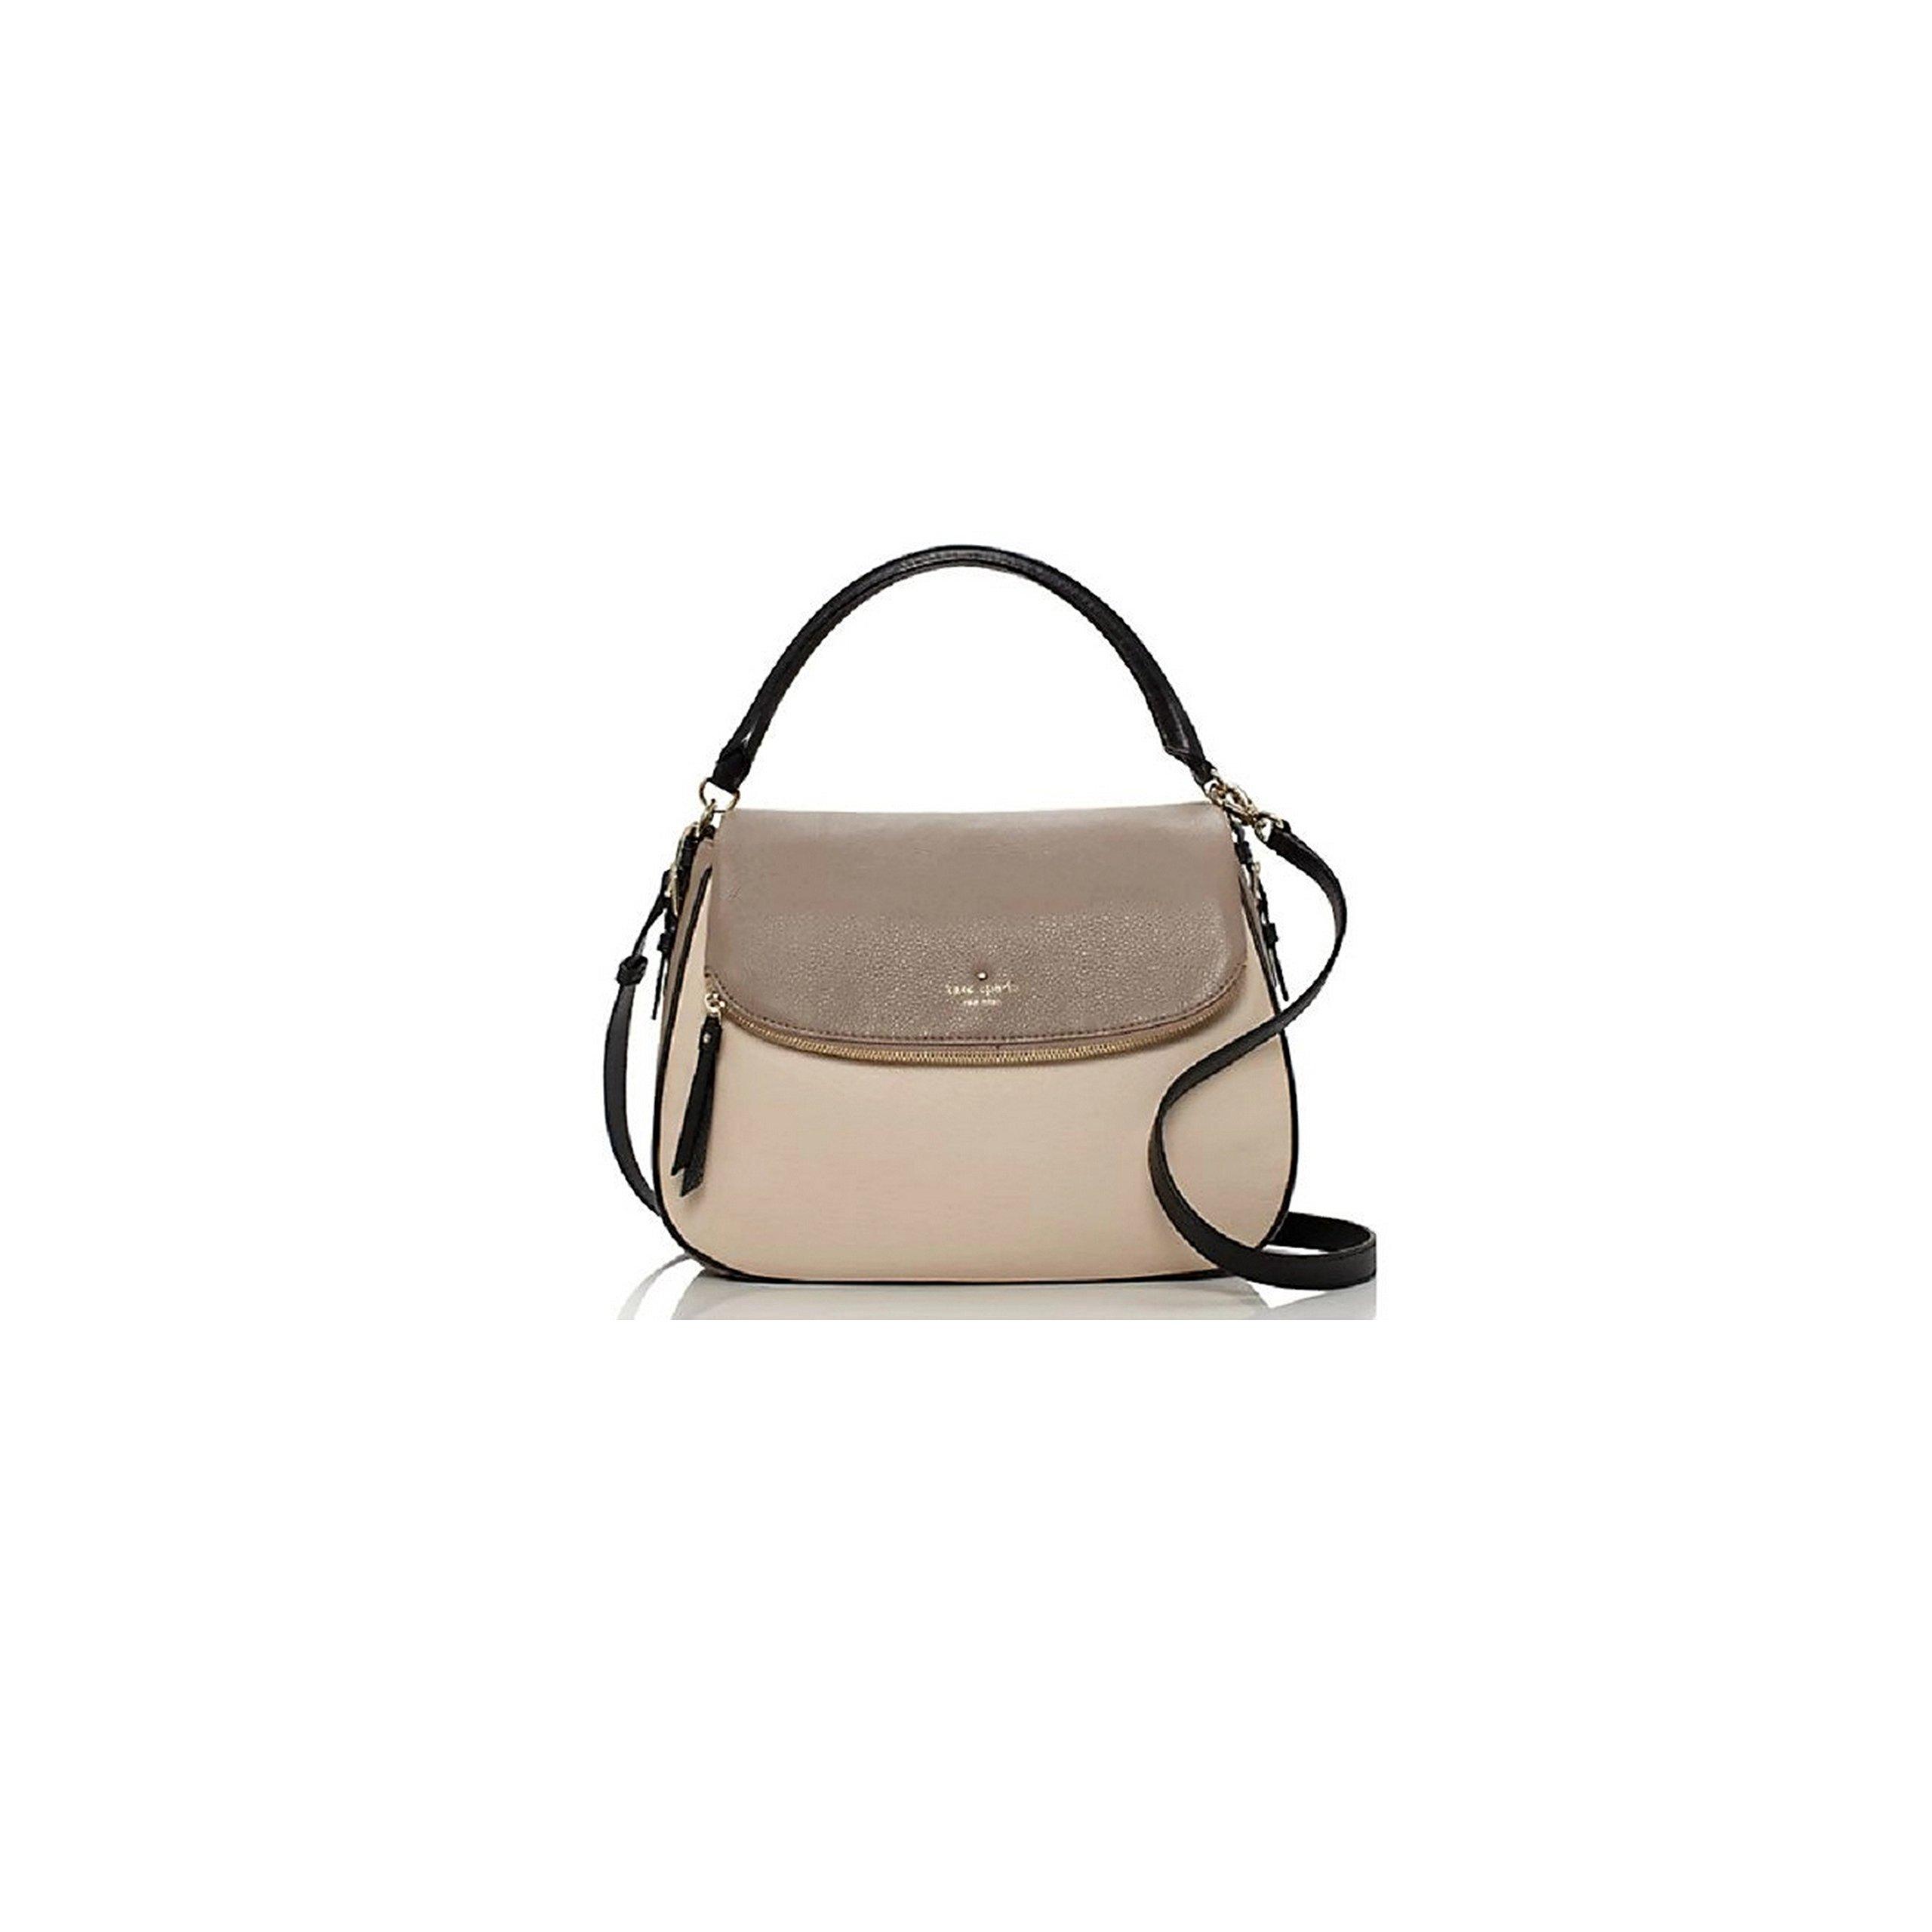 Kate Spade Cobble Hill Devin Leather Handbag Warm Putty/Black, PXRU 5154